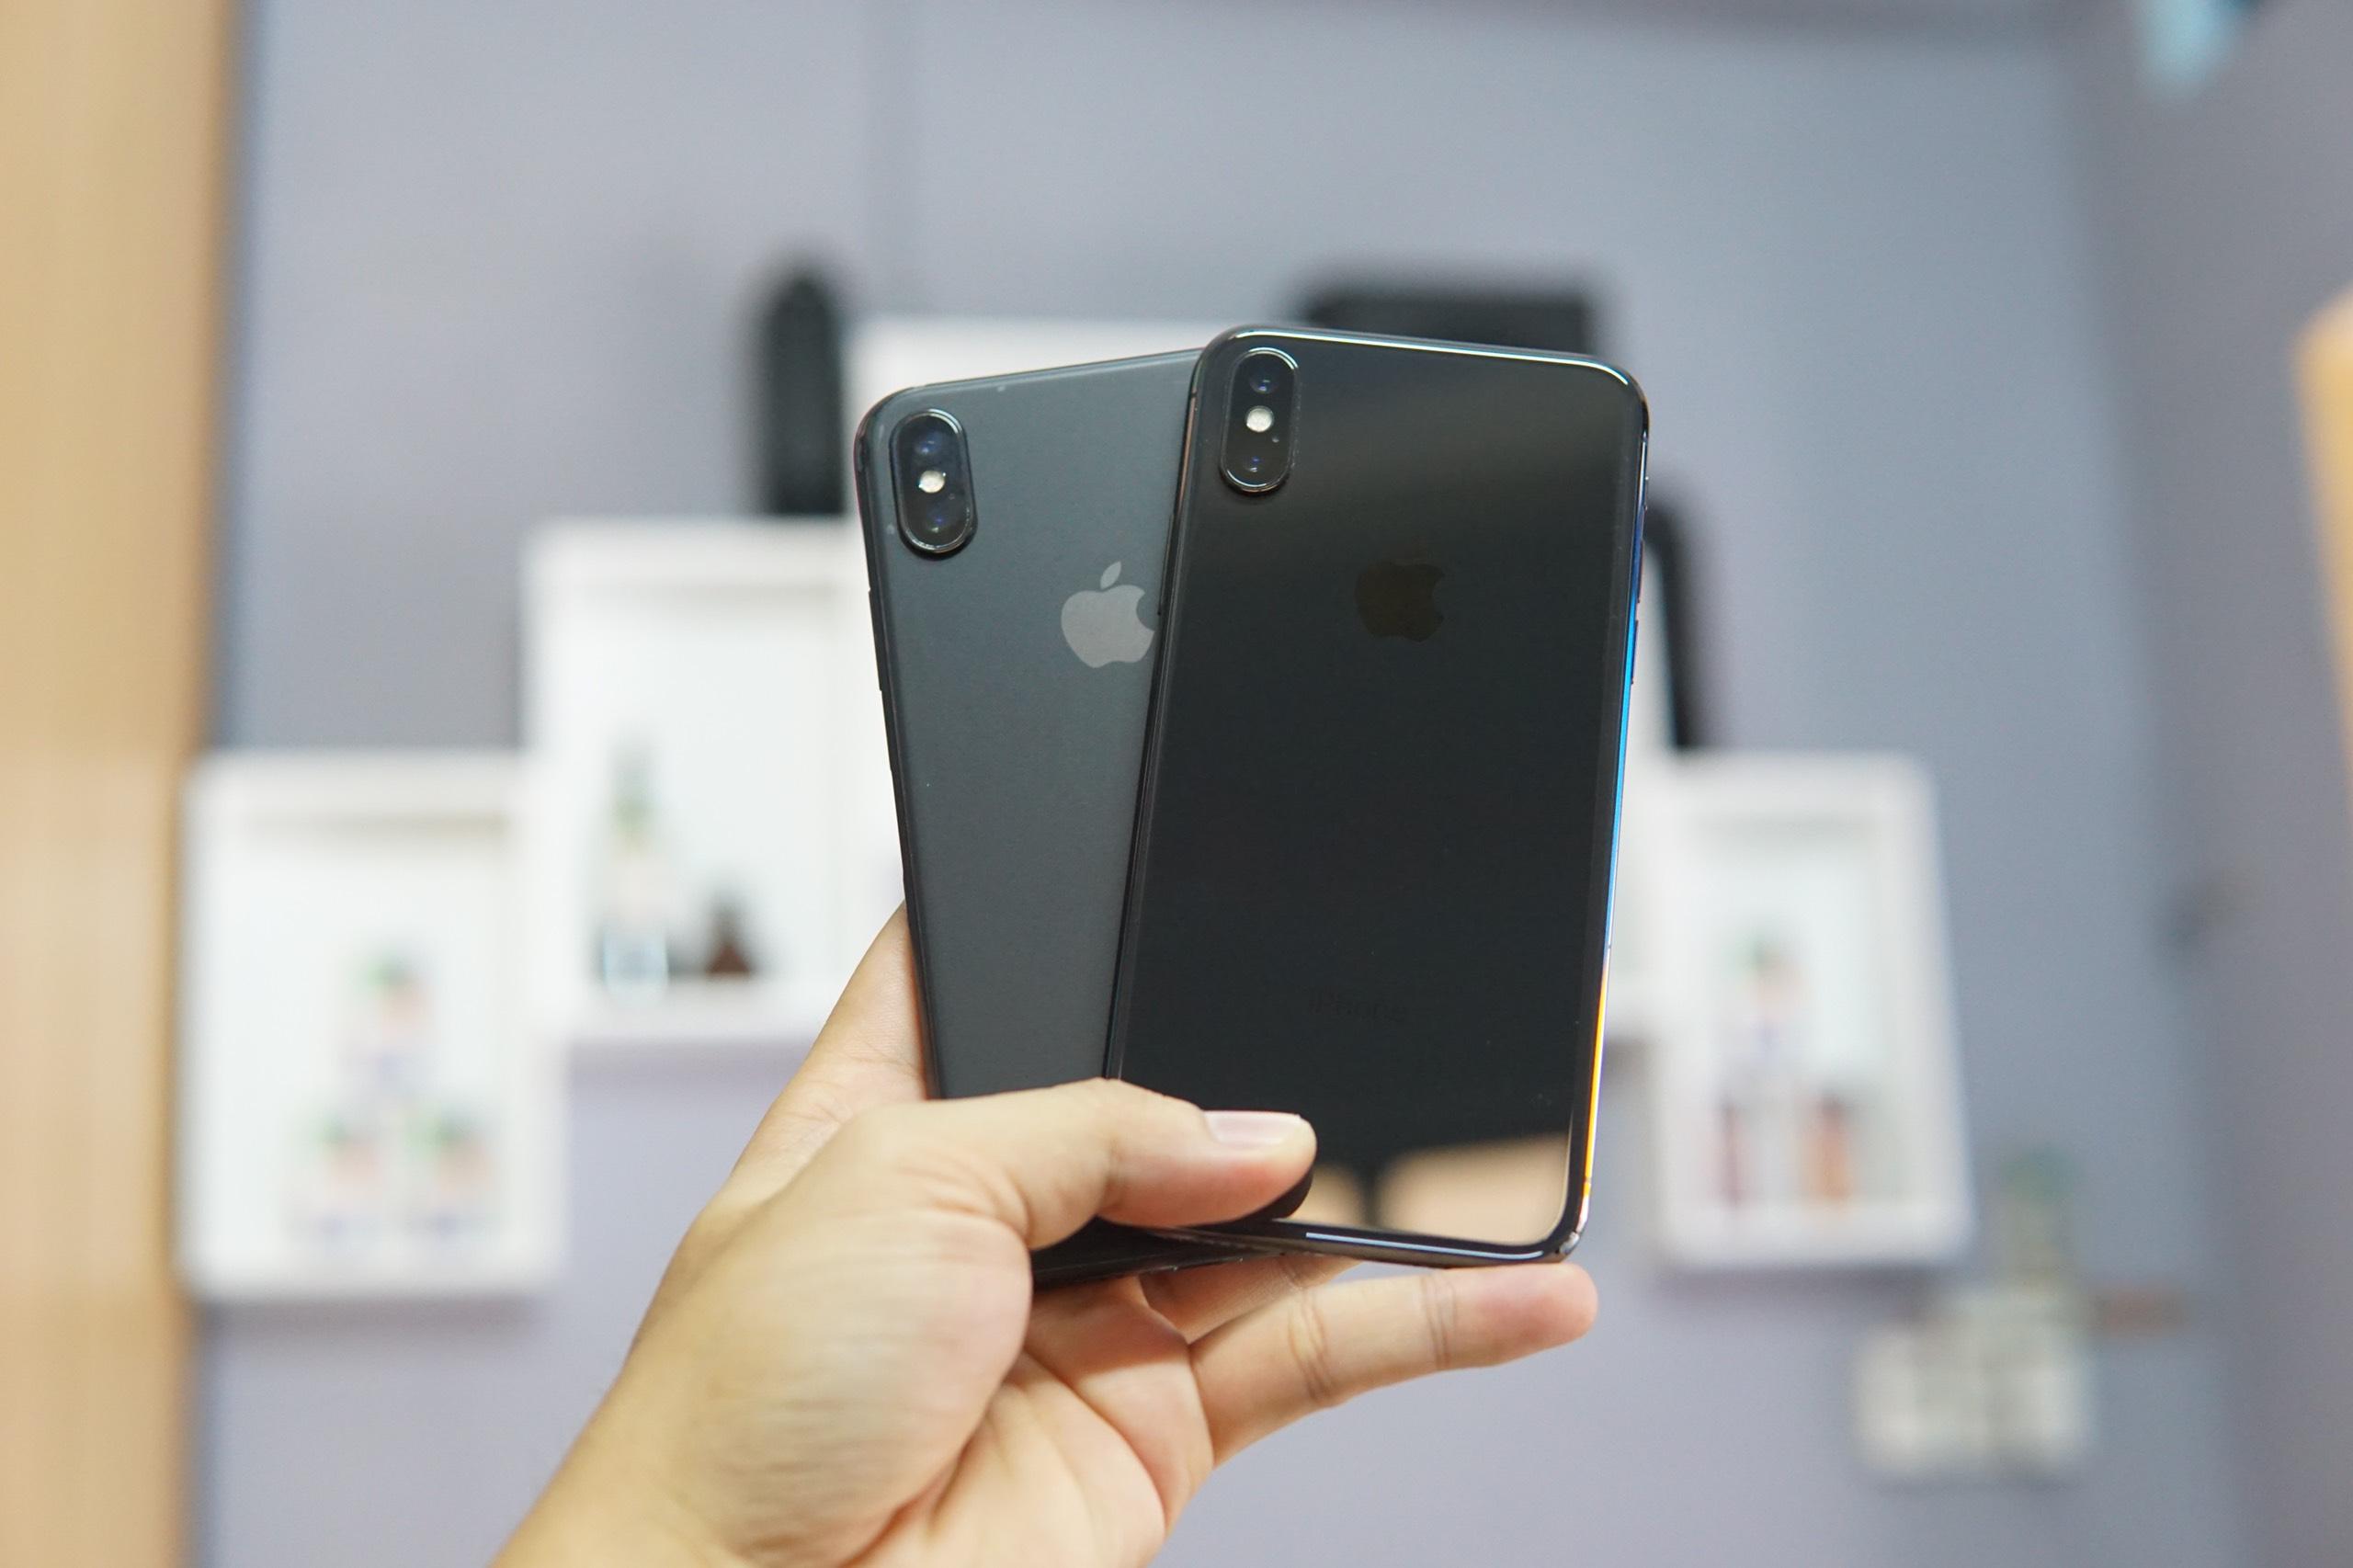 iPhone XS Zin All Quốc Tế